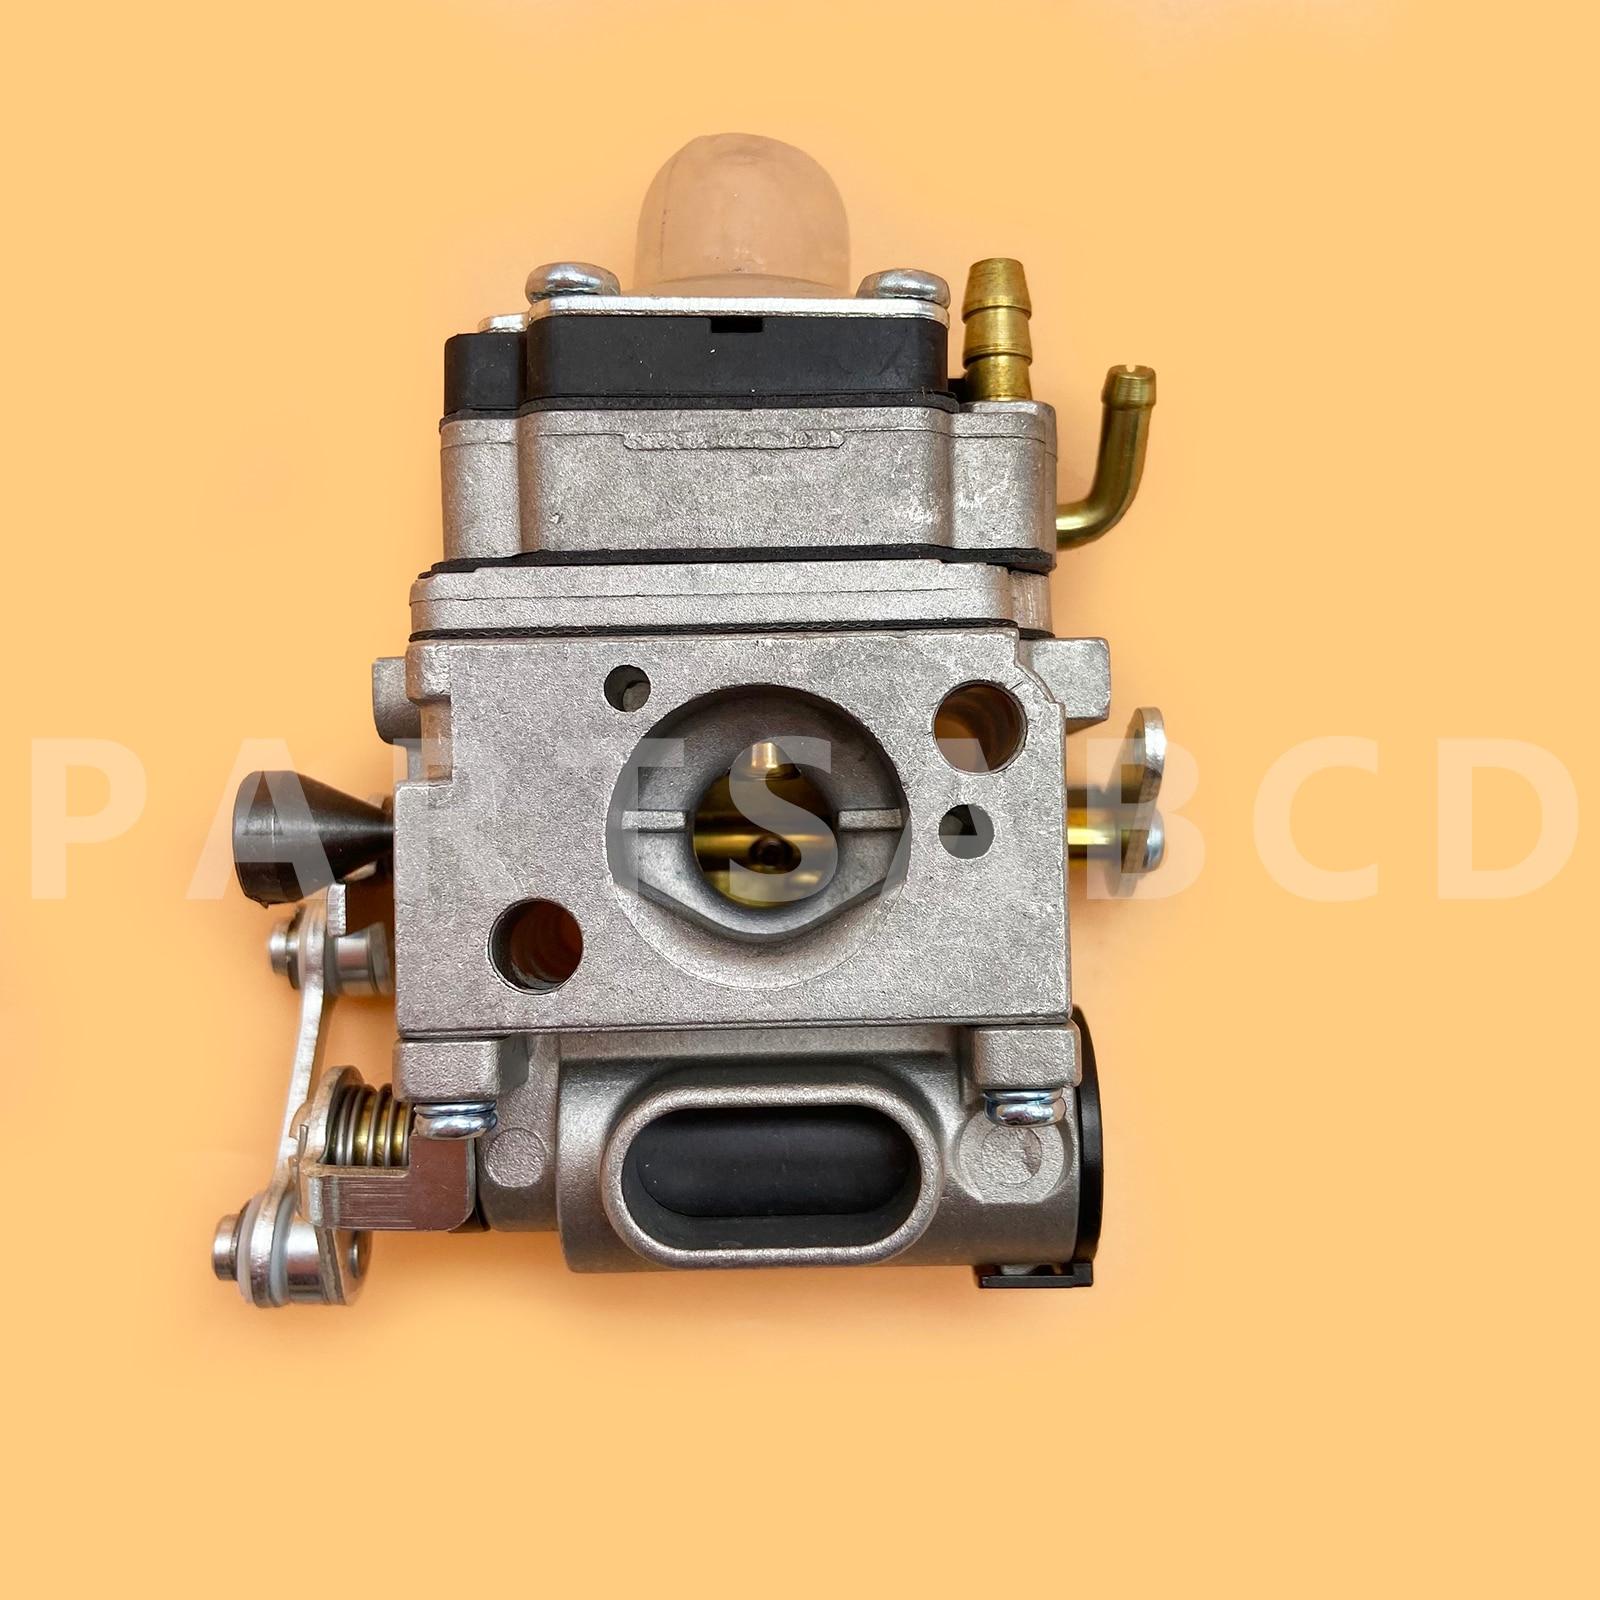 Novo WLA-6-1 carb apto walbro carburador para echo PB-500 a021001642